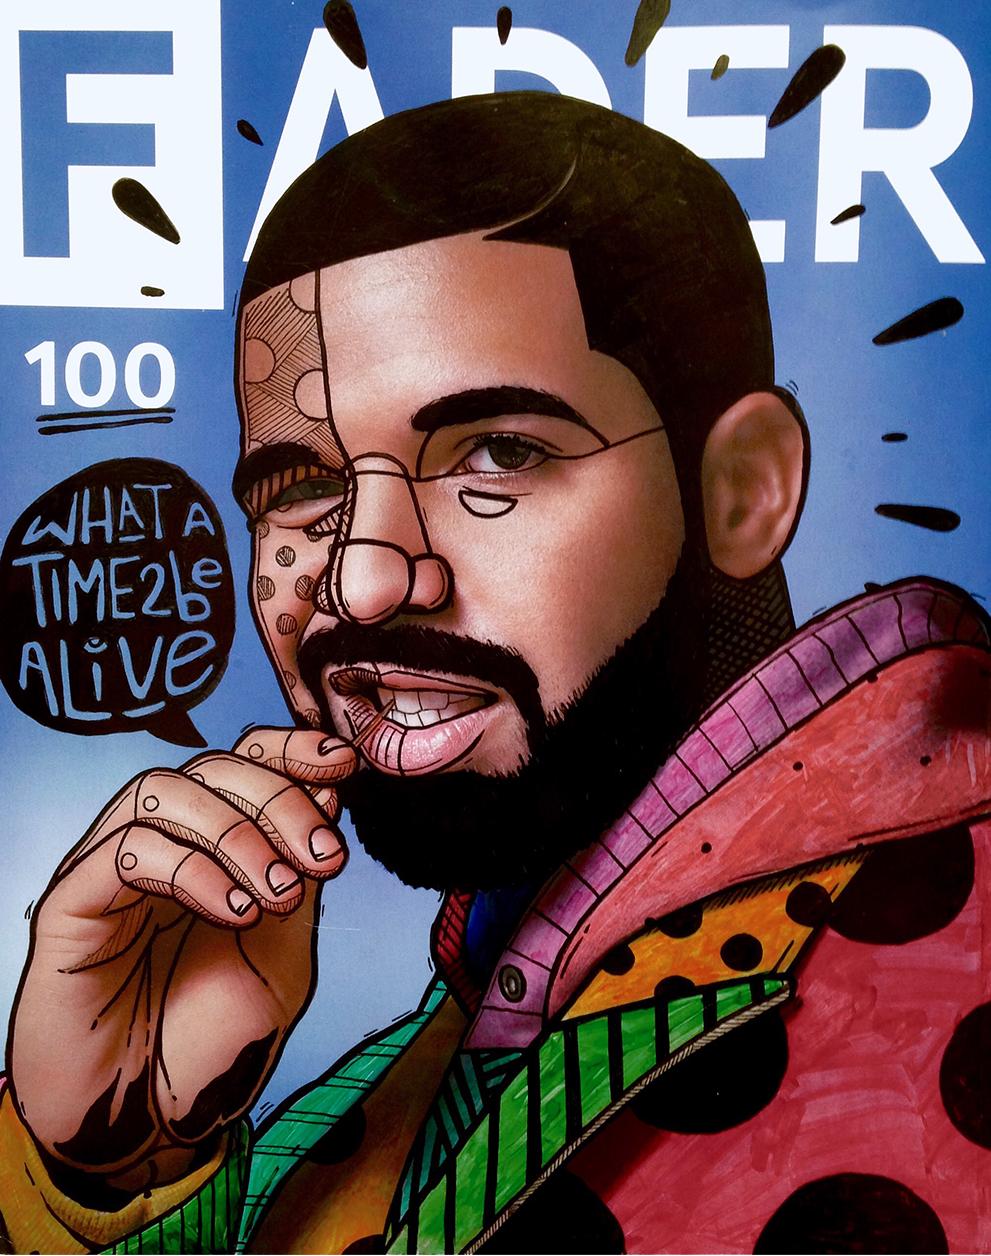 FADER 100, Featuring Drake & Rhianna - Artwork by Founder @AdamEast